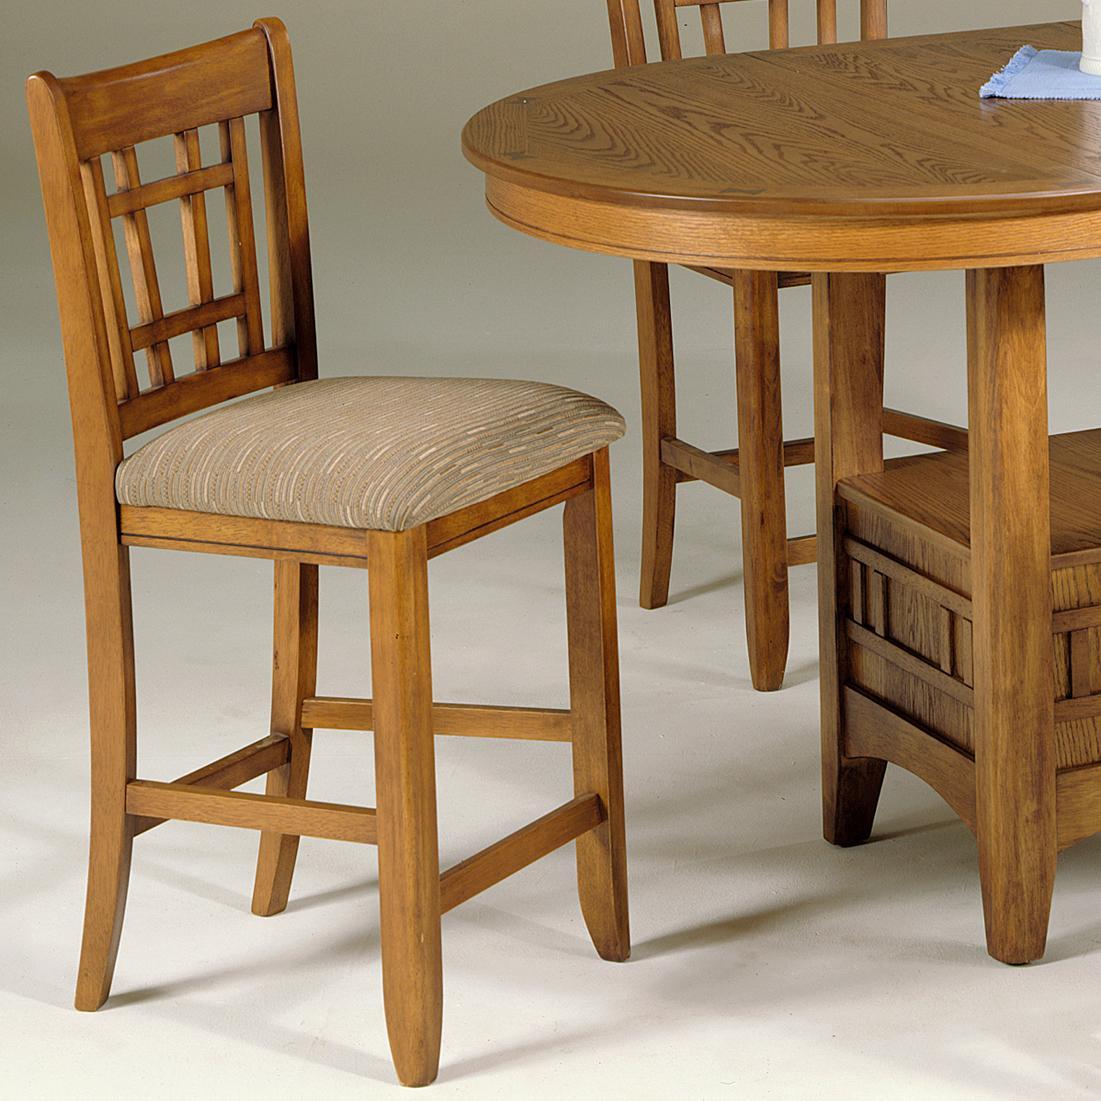 Liberty furniture santa rosa 24 inch upholstered barstool for Furniture 24